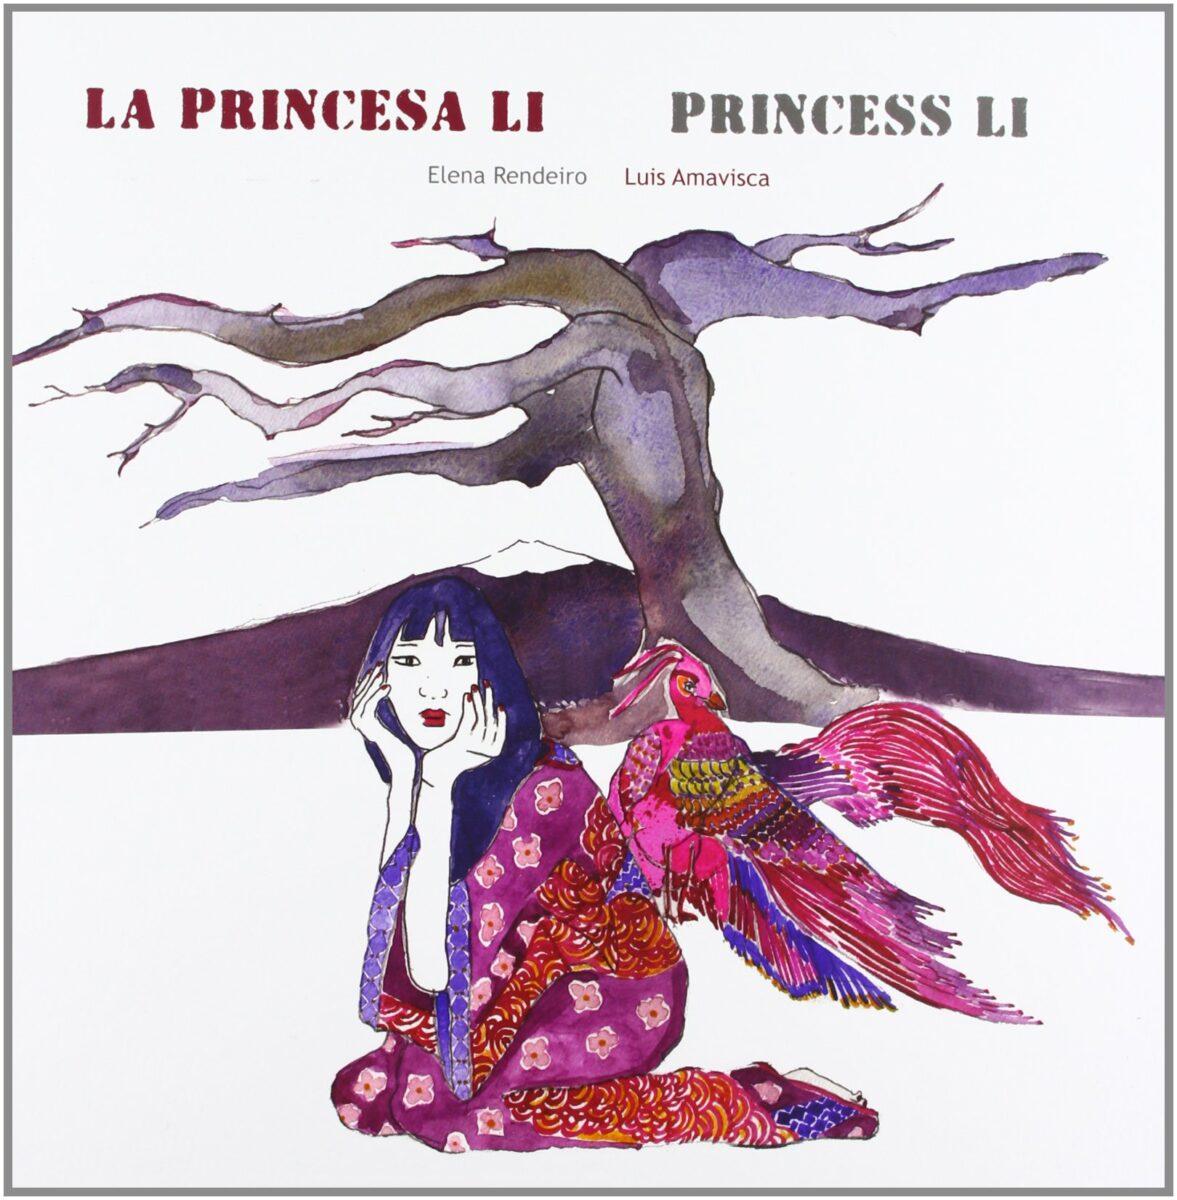 libros LGBT+ para niños princesa Li